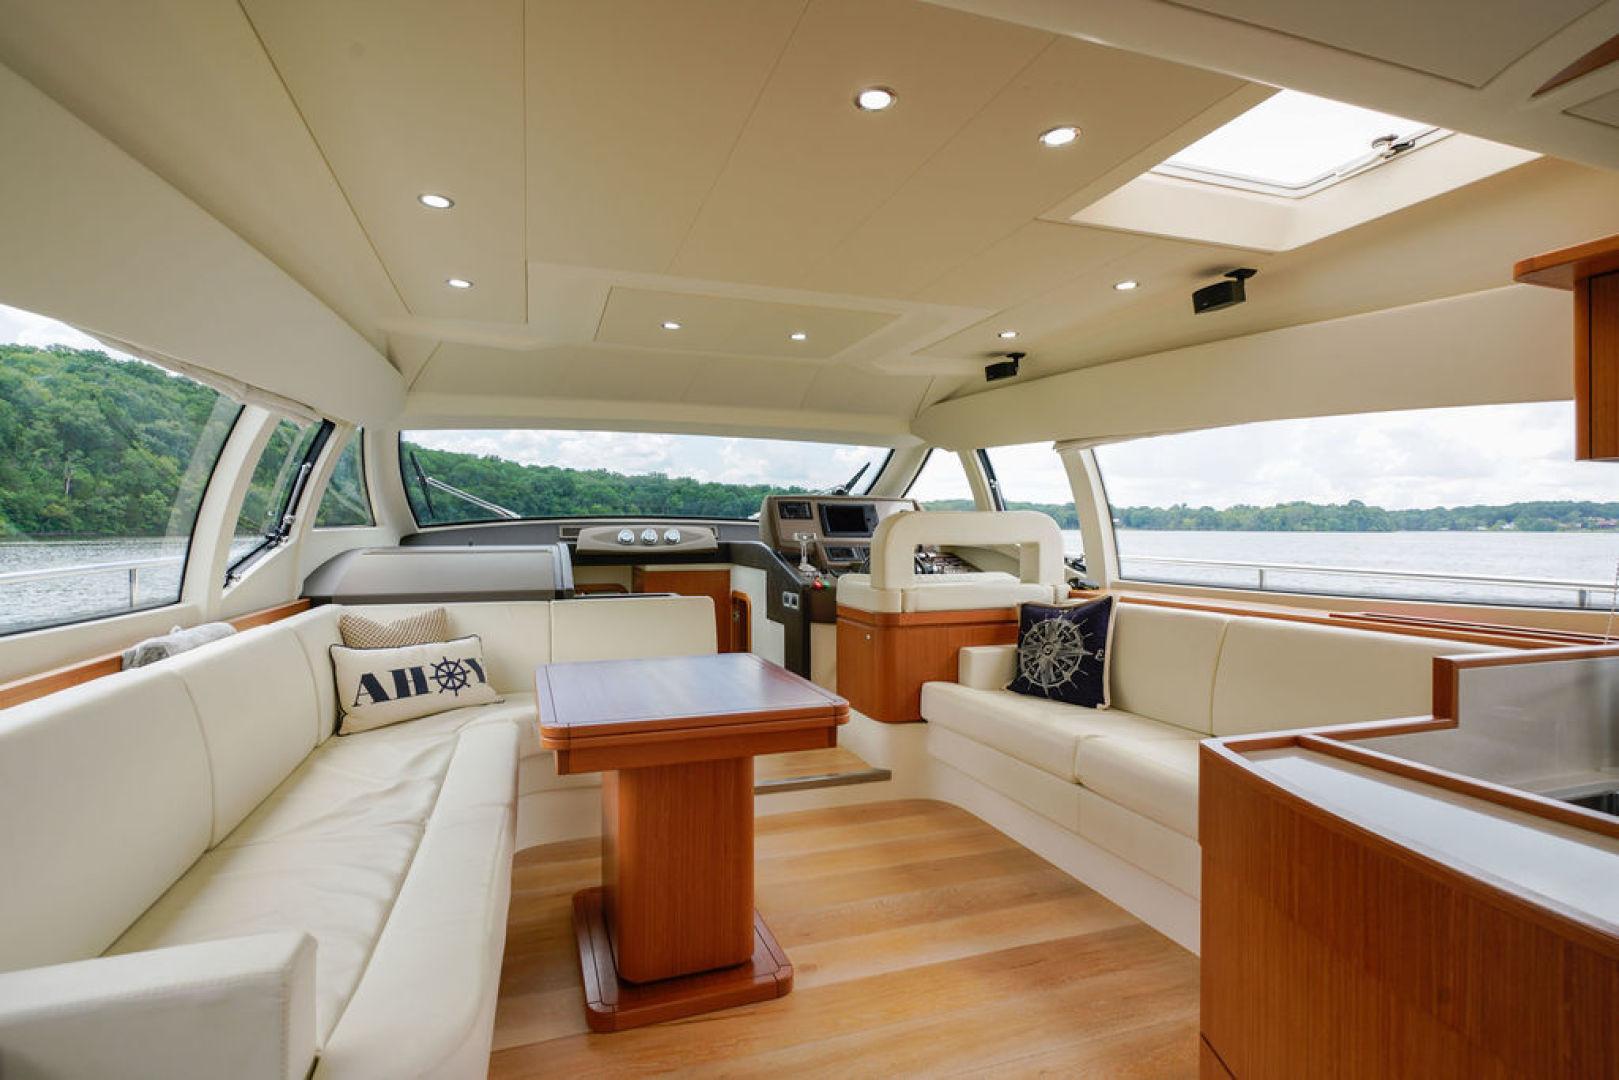 Ferretti Yachts-530 2013-ISLAND GIRL Mount Juliet-Tennessee-United States-1574695   Thumbnail